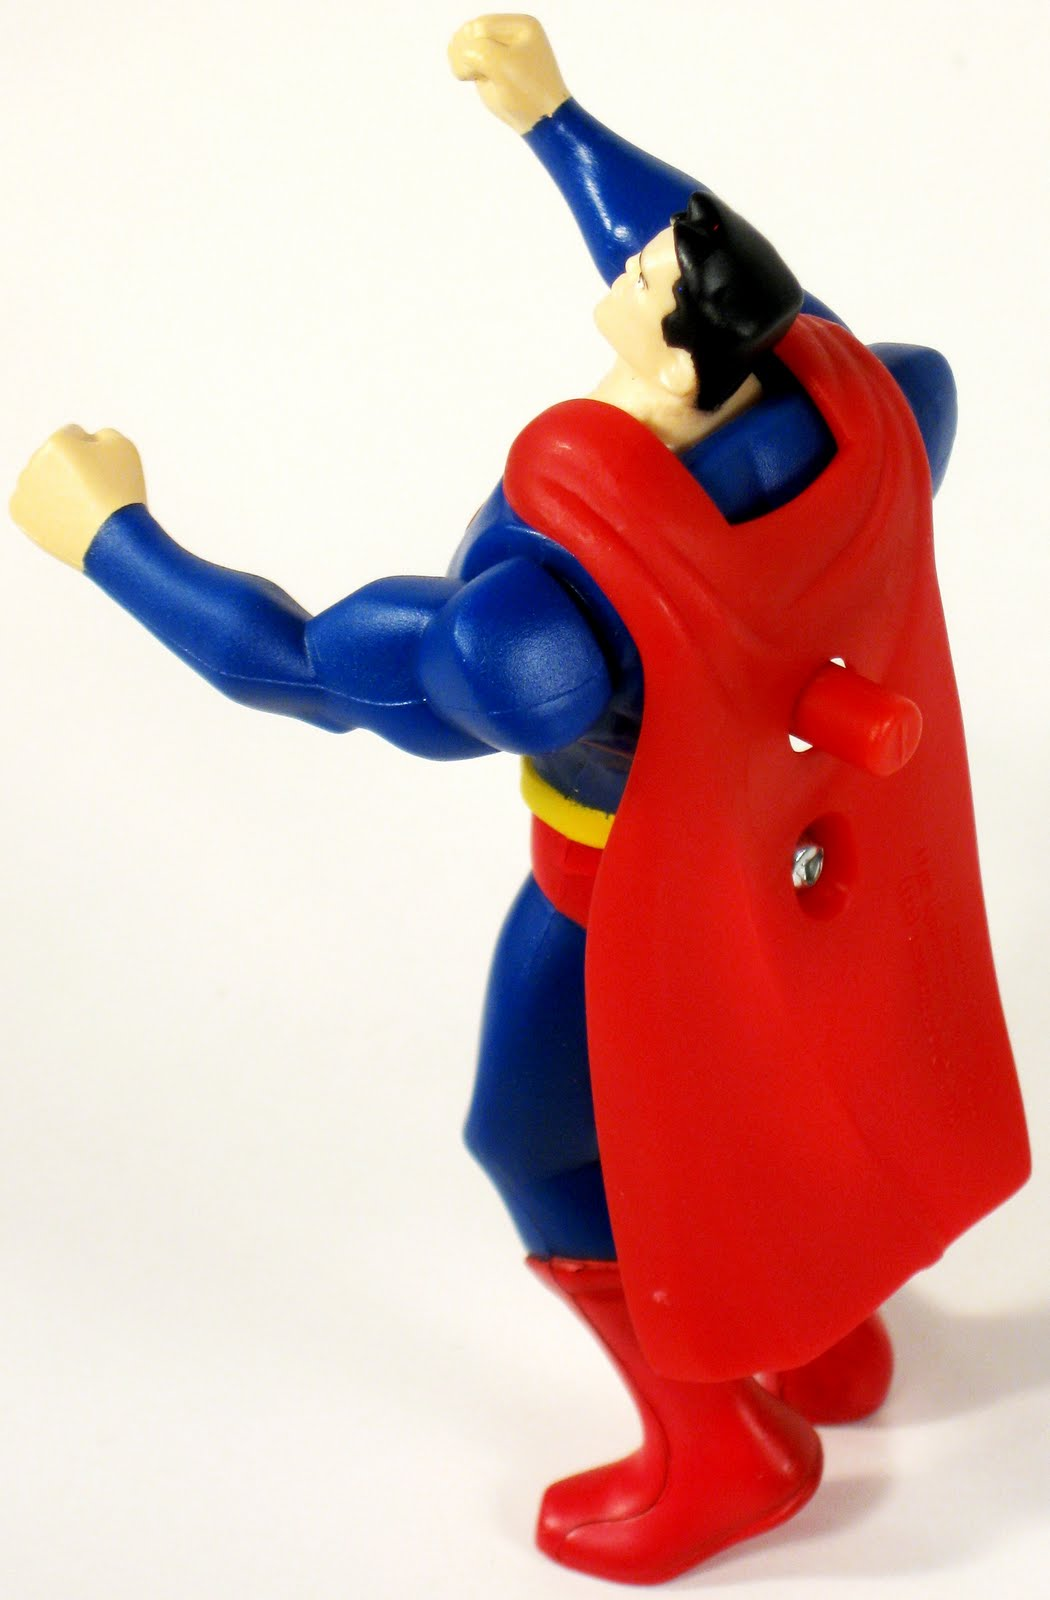 http://4.bp.blogspot.com/-FXFtNYXpCas/TgdhSdxCykI/AAAAAAAACBc/jvkrxzqdtIg/s1600/McDonald%2527s+2011+Young+Justice+%25234+Superman+24.JPG